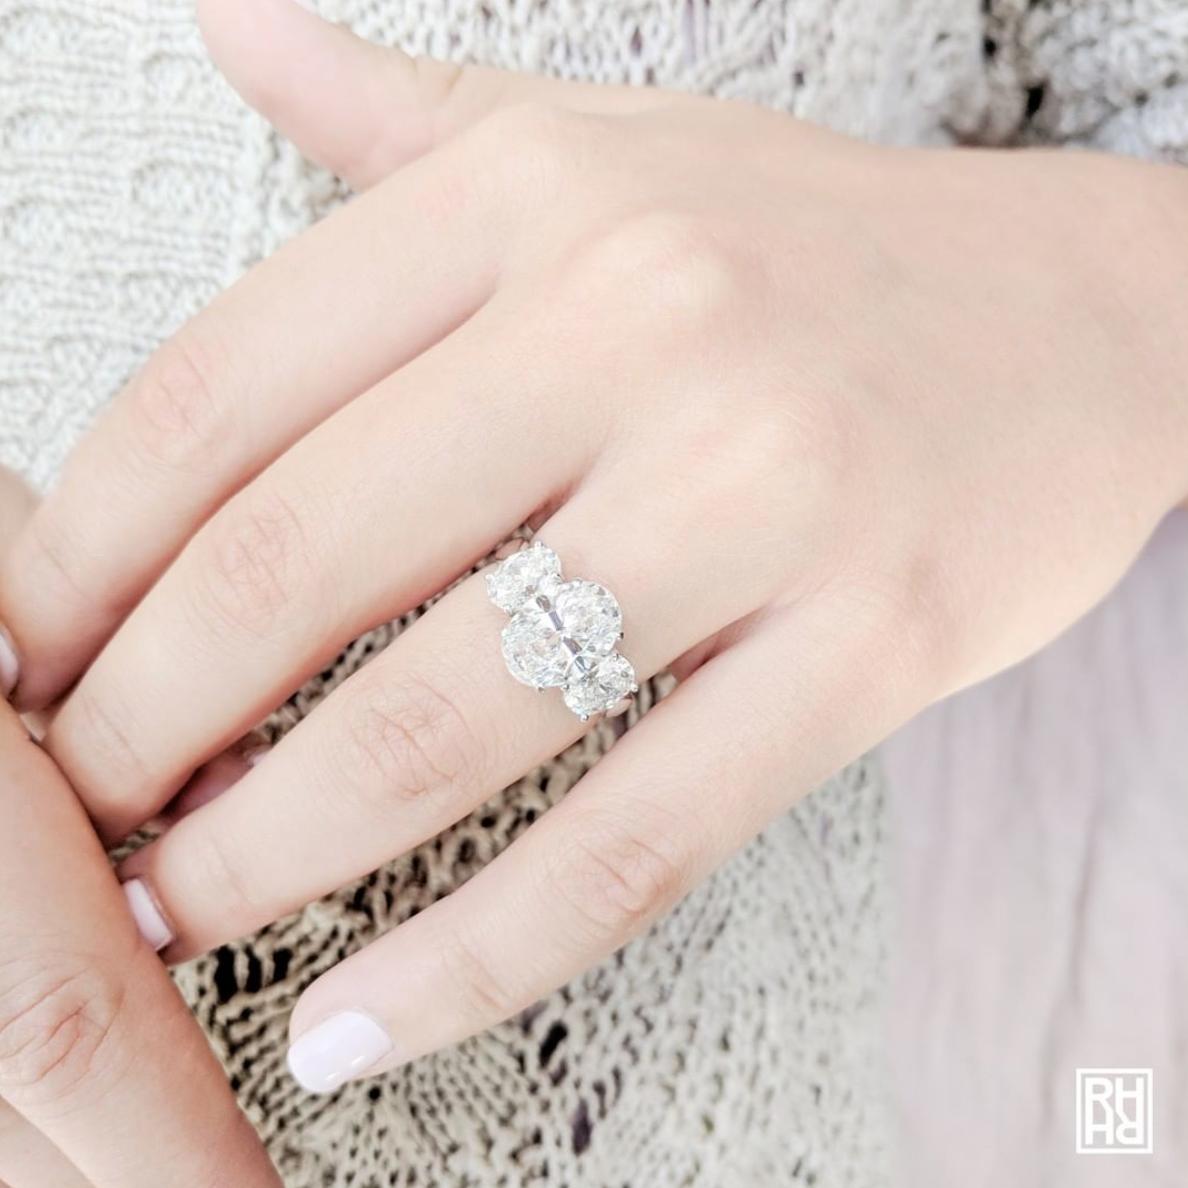 Engagement Ring Styles In 2019 Wedding Jewelry Idotaketwo Com